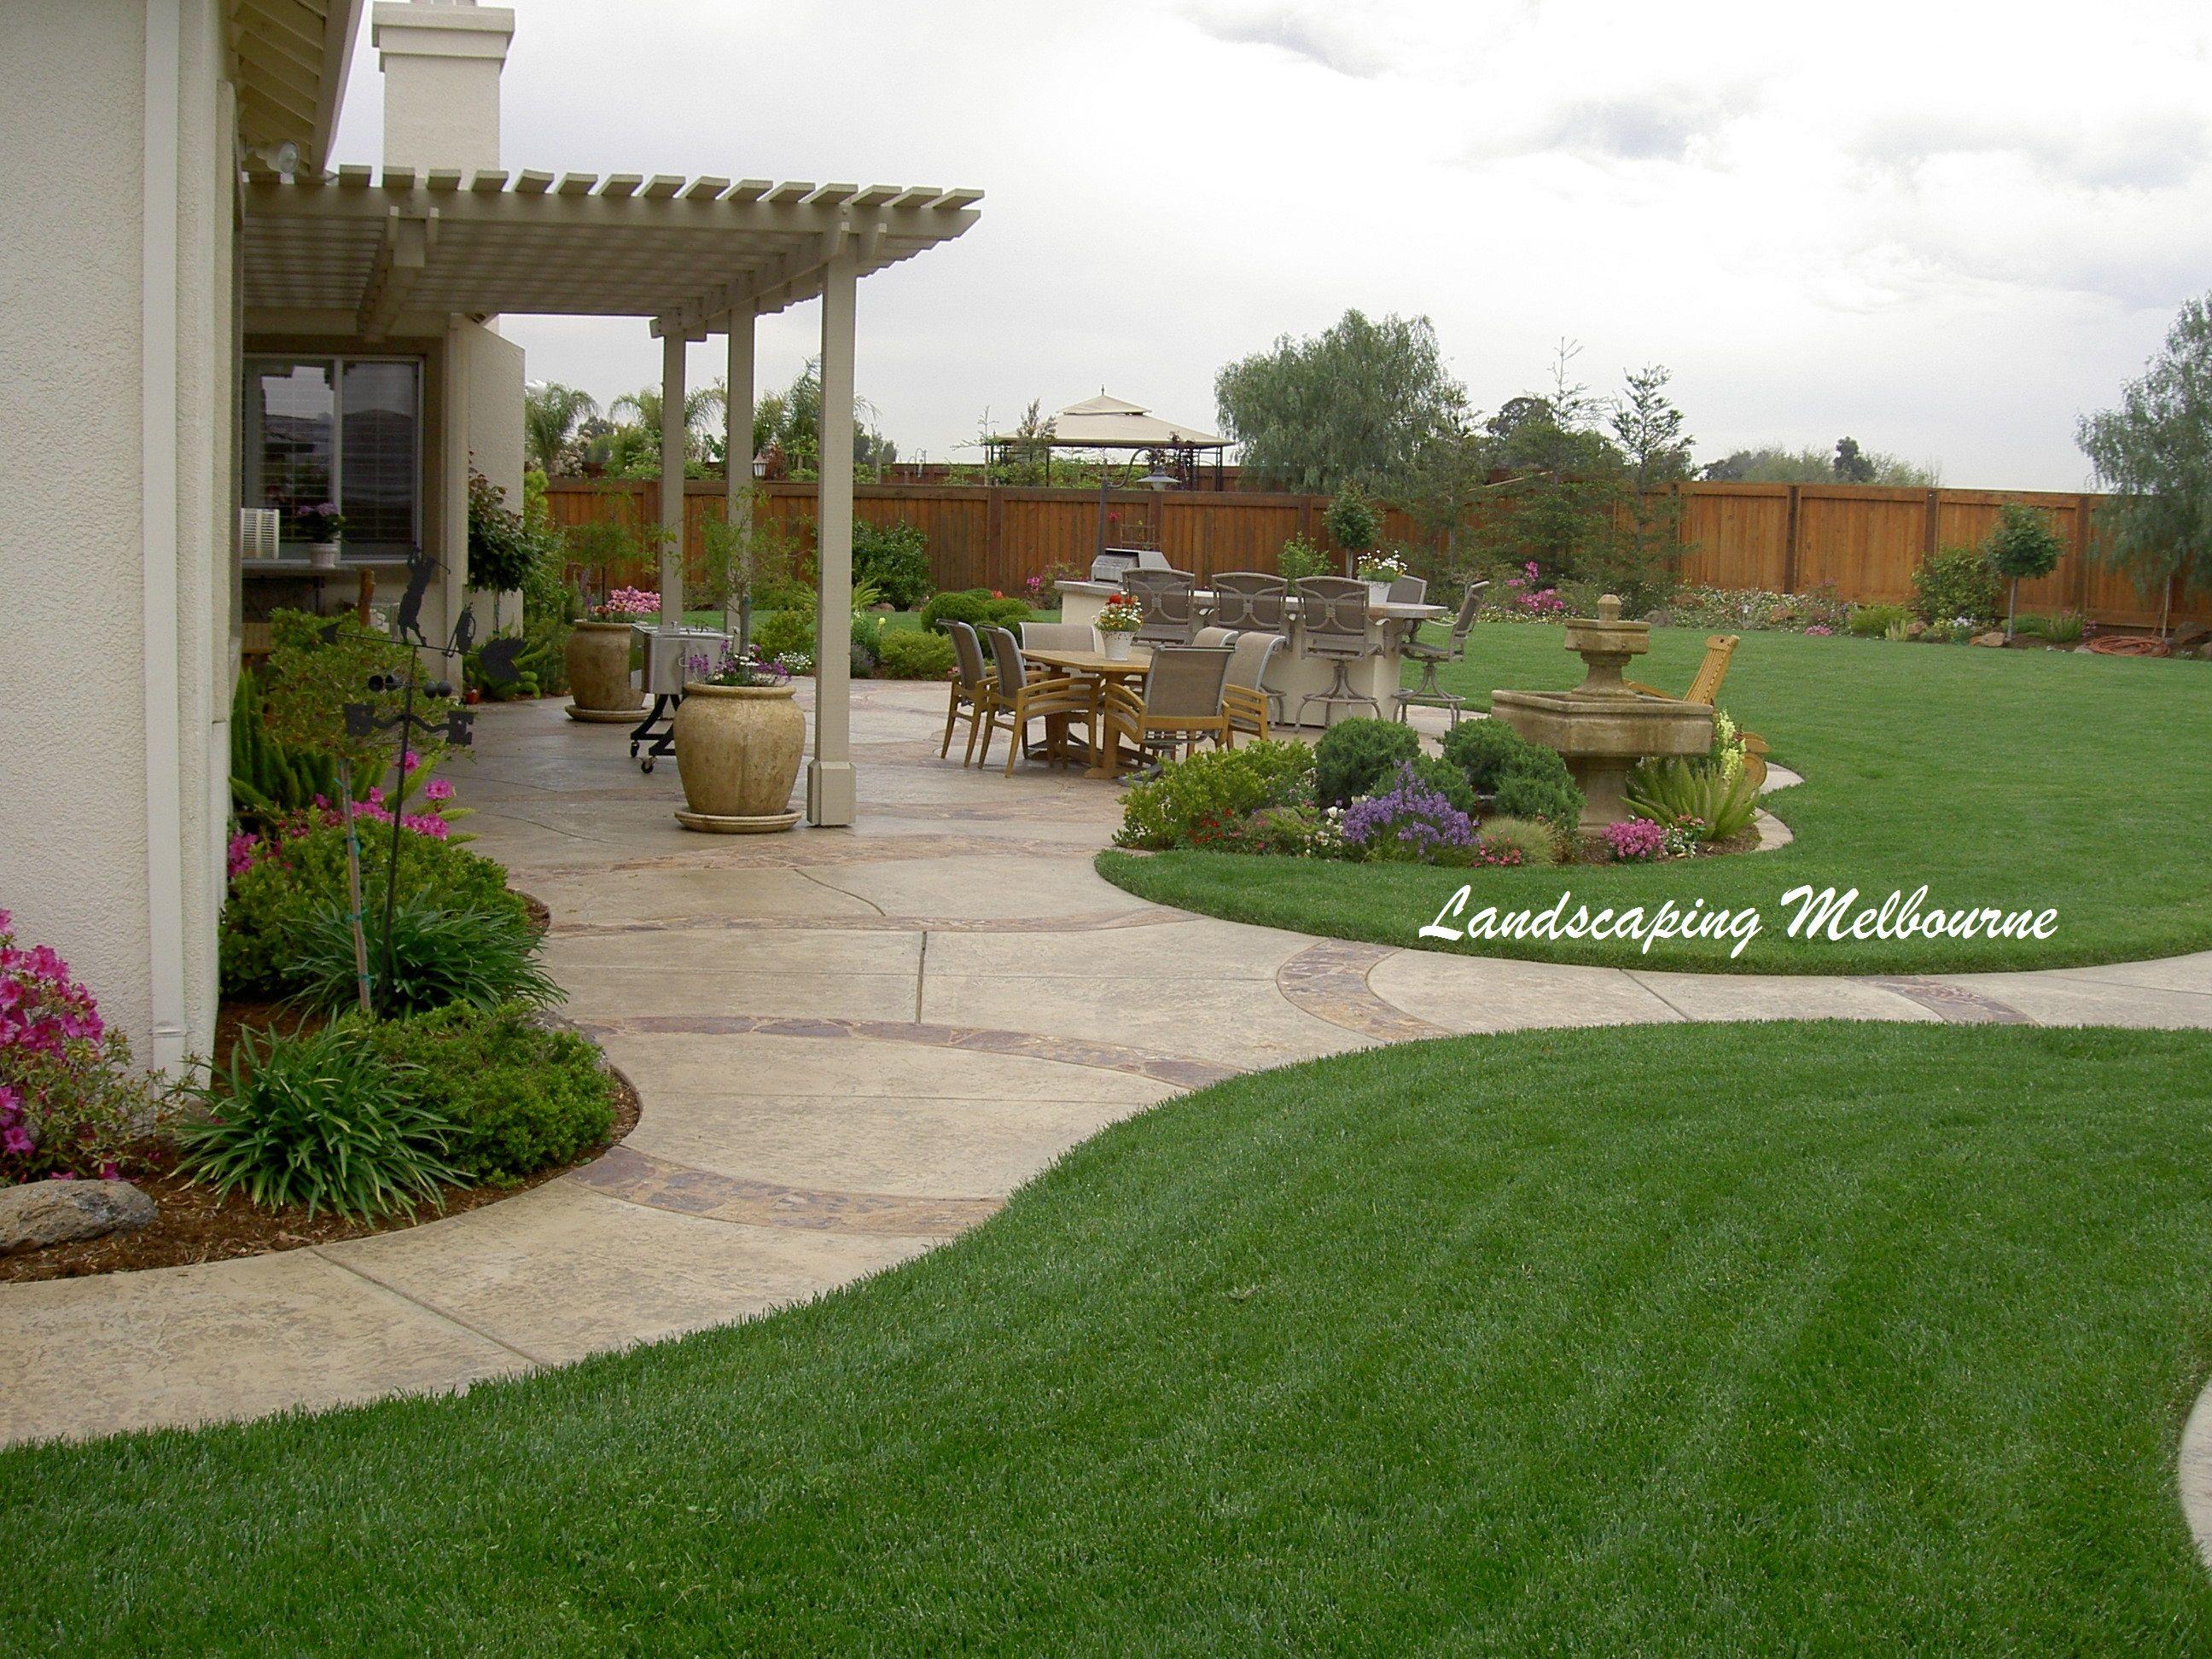 Melbourne Large Backyard Landscaping Patio Landscaping Easy Backyard Backyard garden ideas melbourne